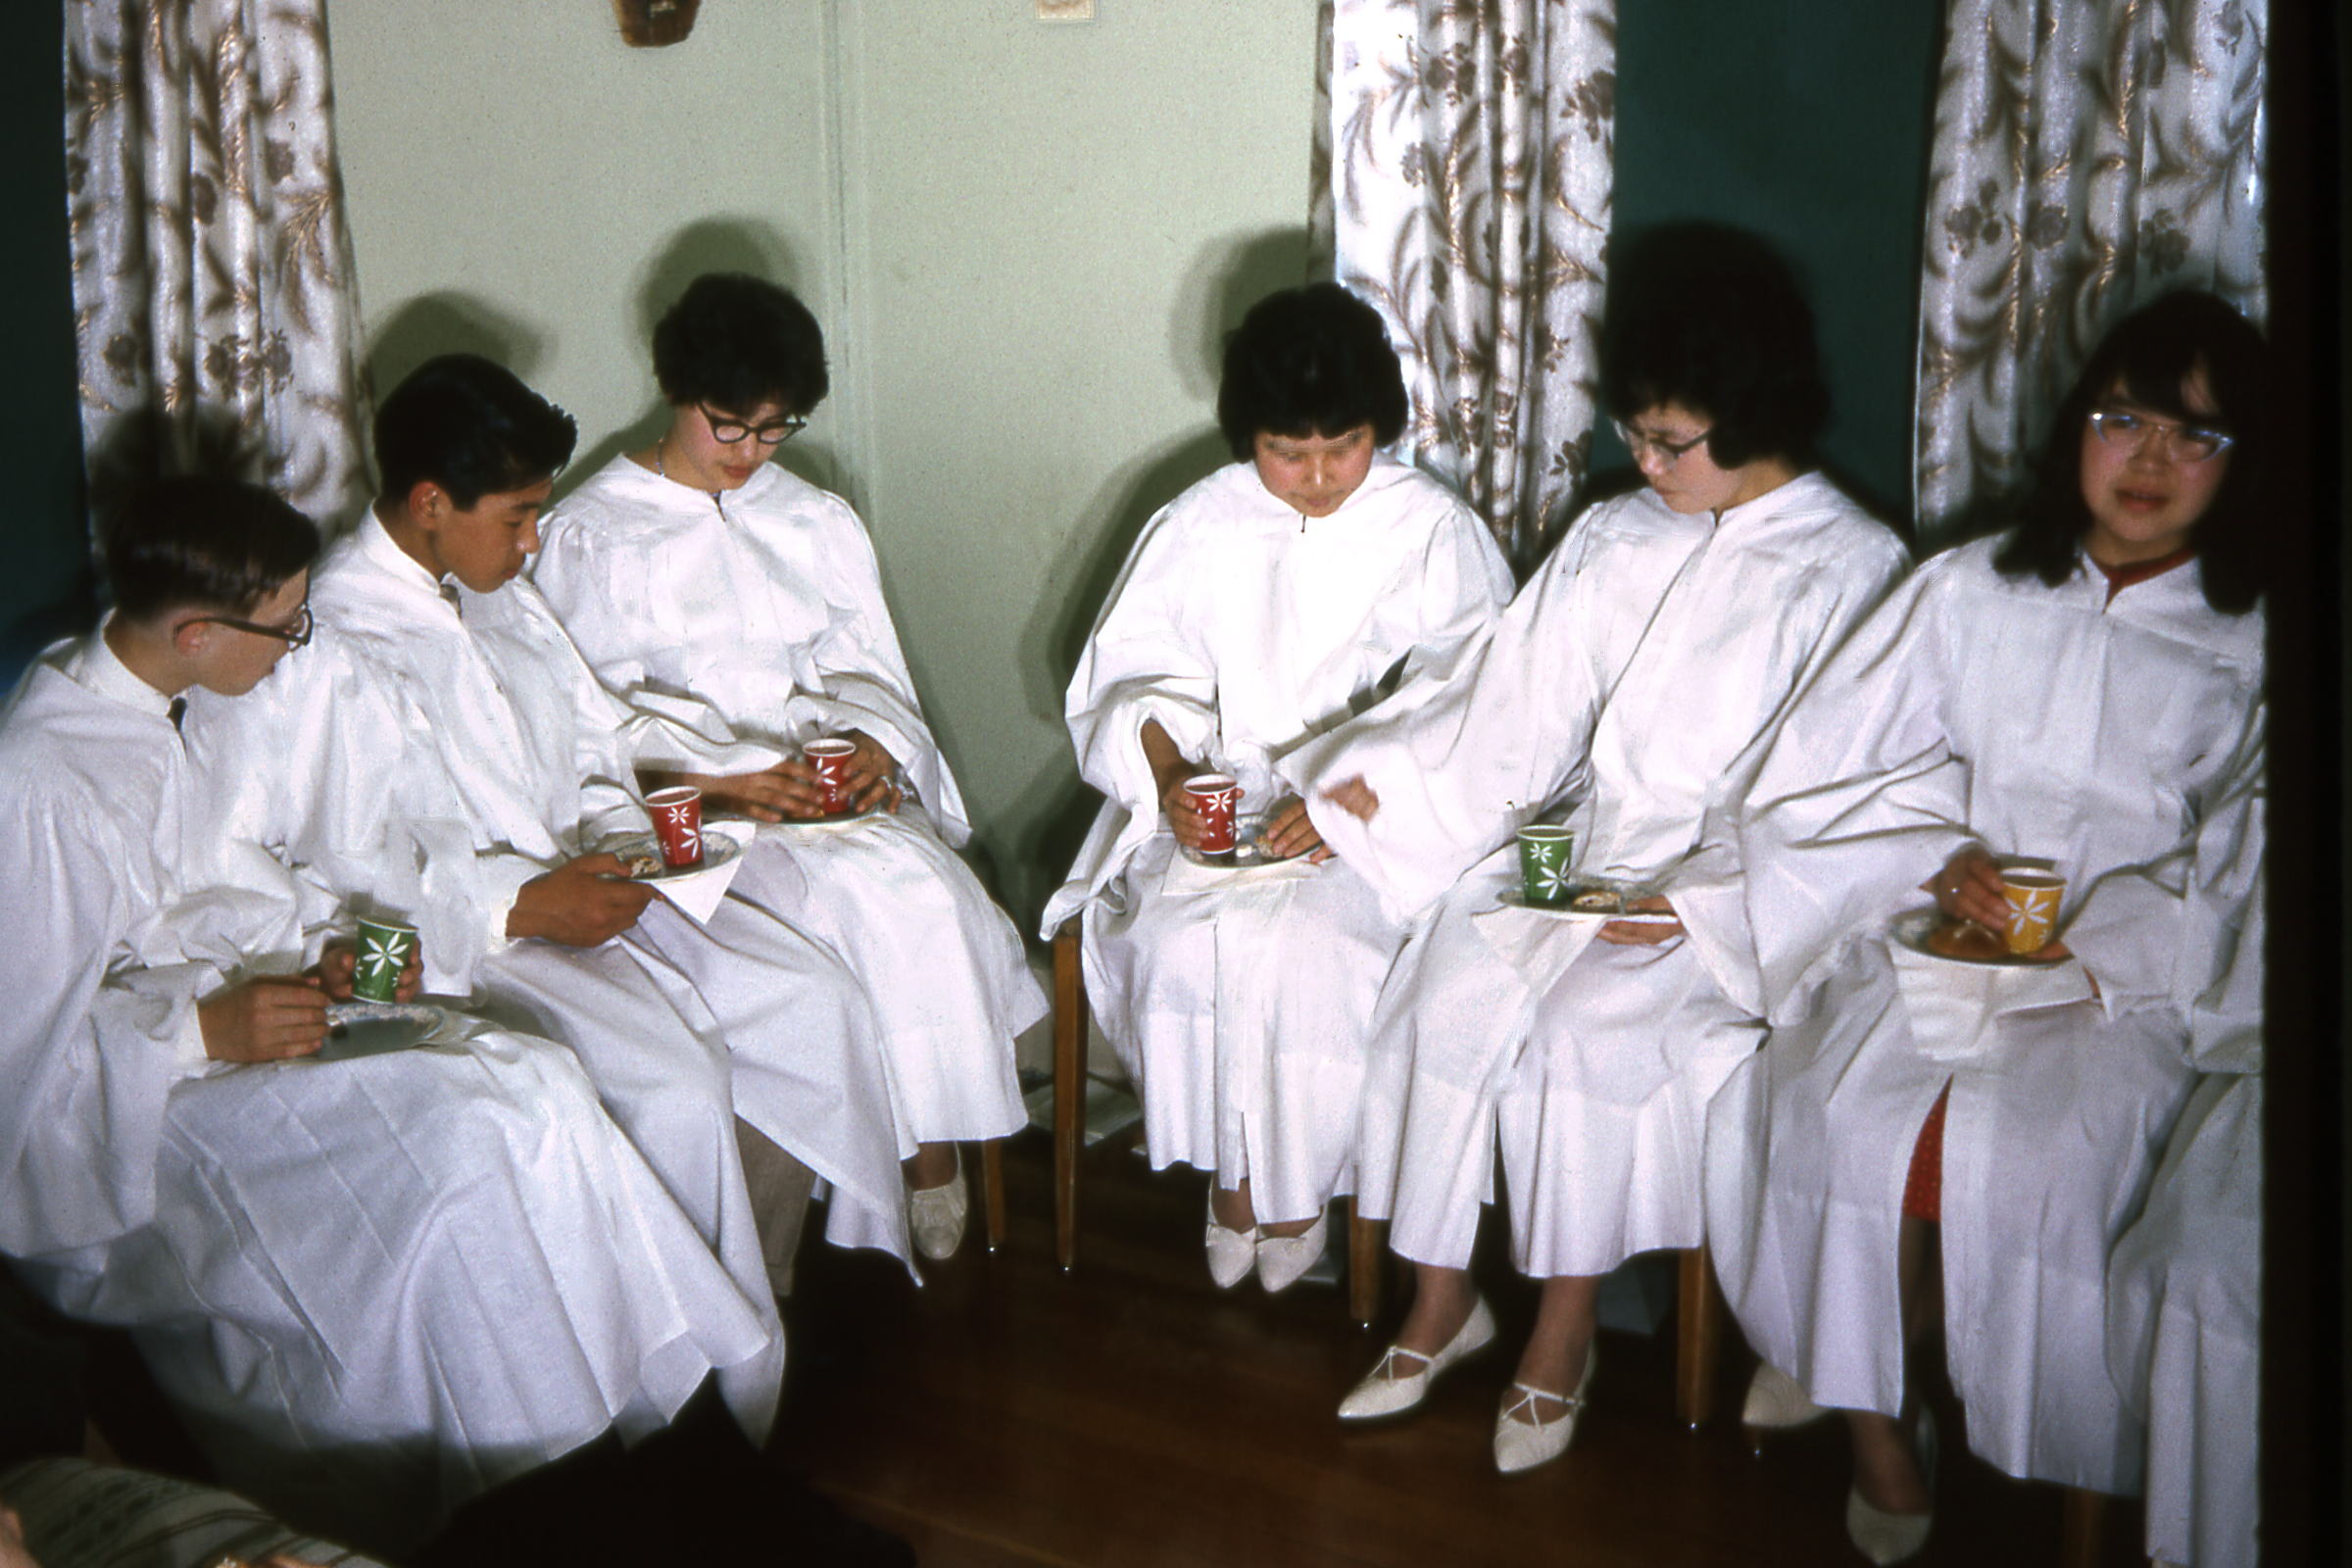 1965 Confirmation Class